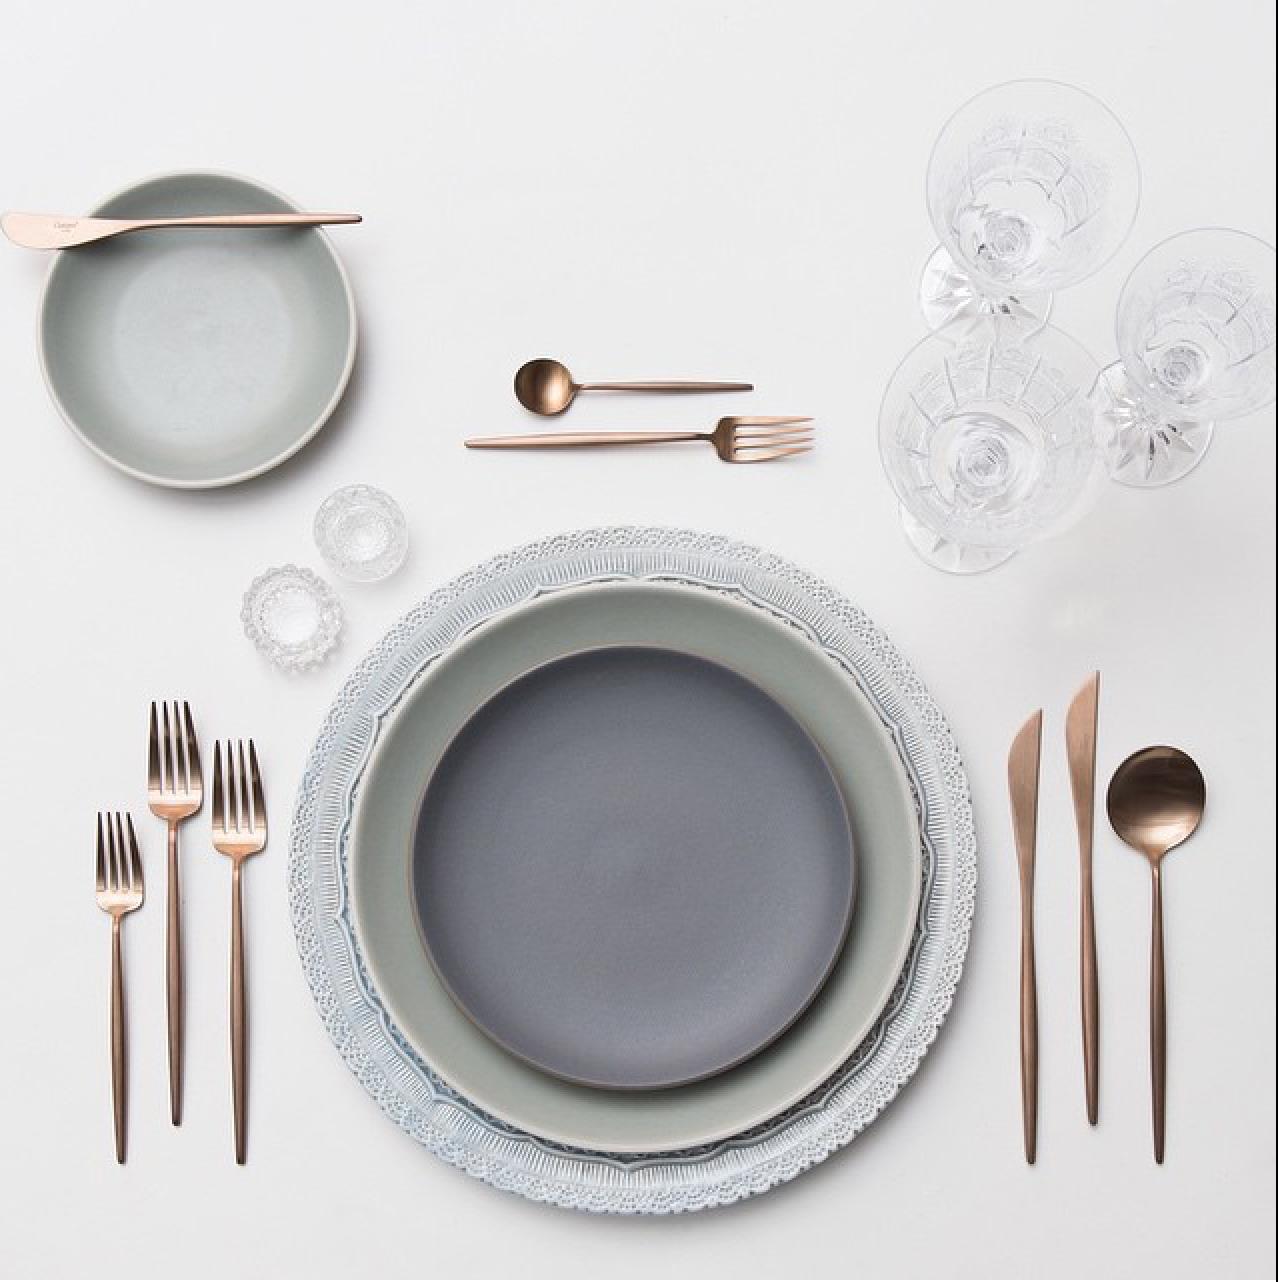 Soft Matte Grey Gold Flatware Clear Stemware Wedding Tablescapes Rose Gold Flatware Heath Ceramics Casa De Perrin